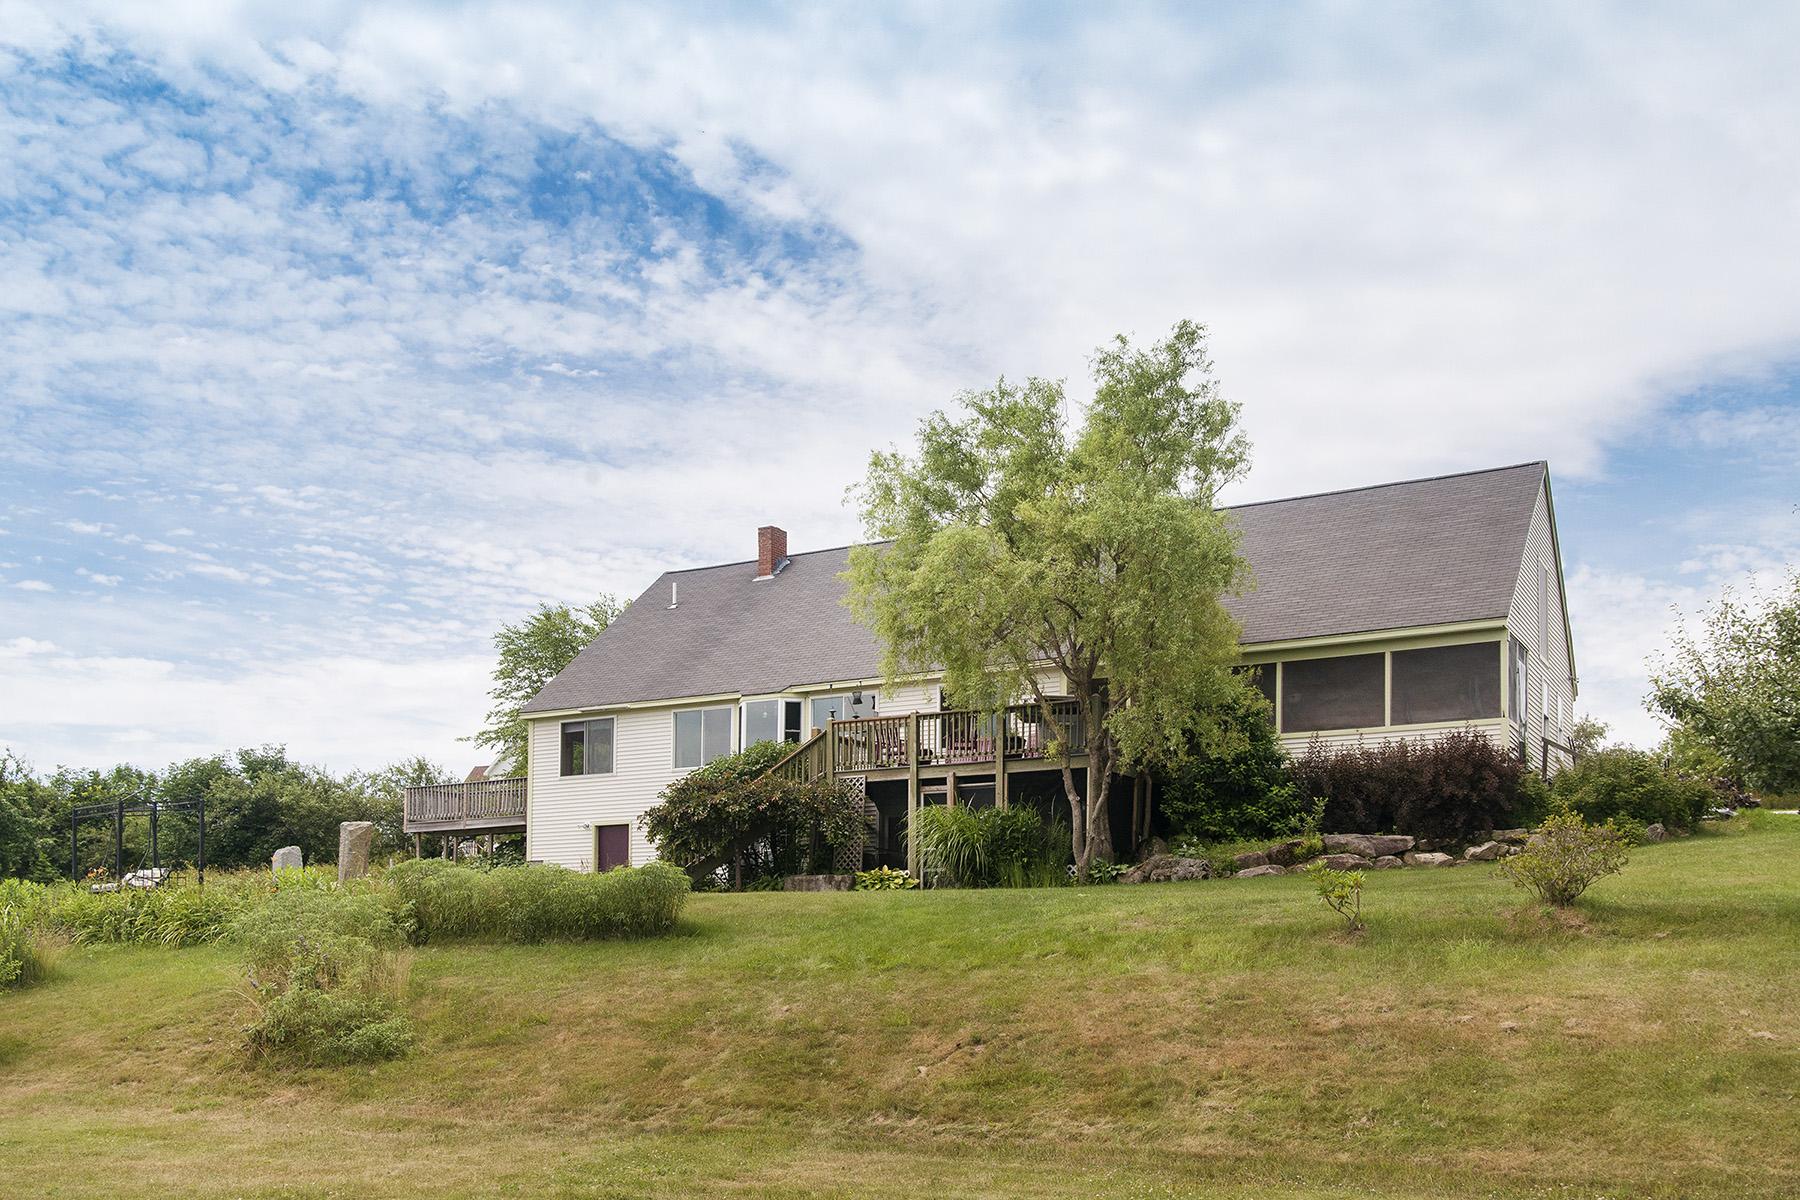 Moradia para Venda às 17 Orchard View Drive Waterford, Maine, 04088 Estados Unidos